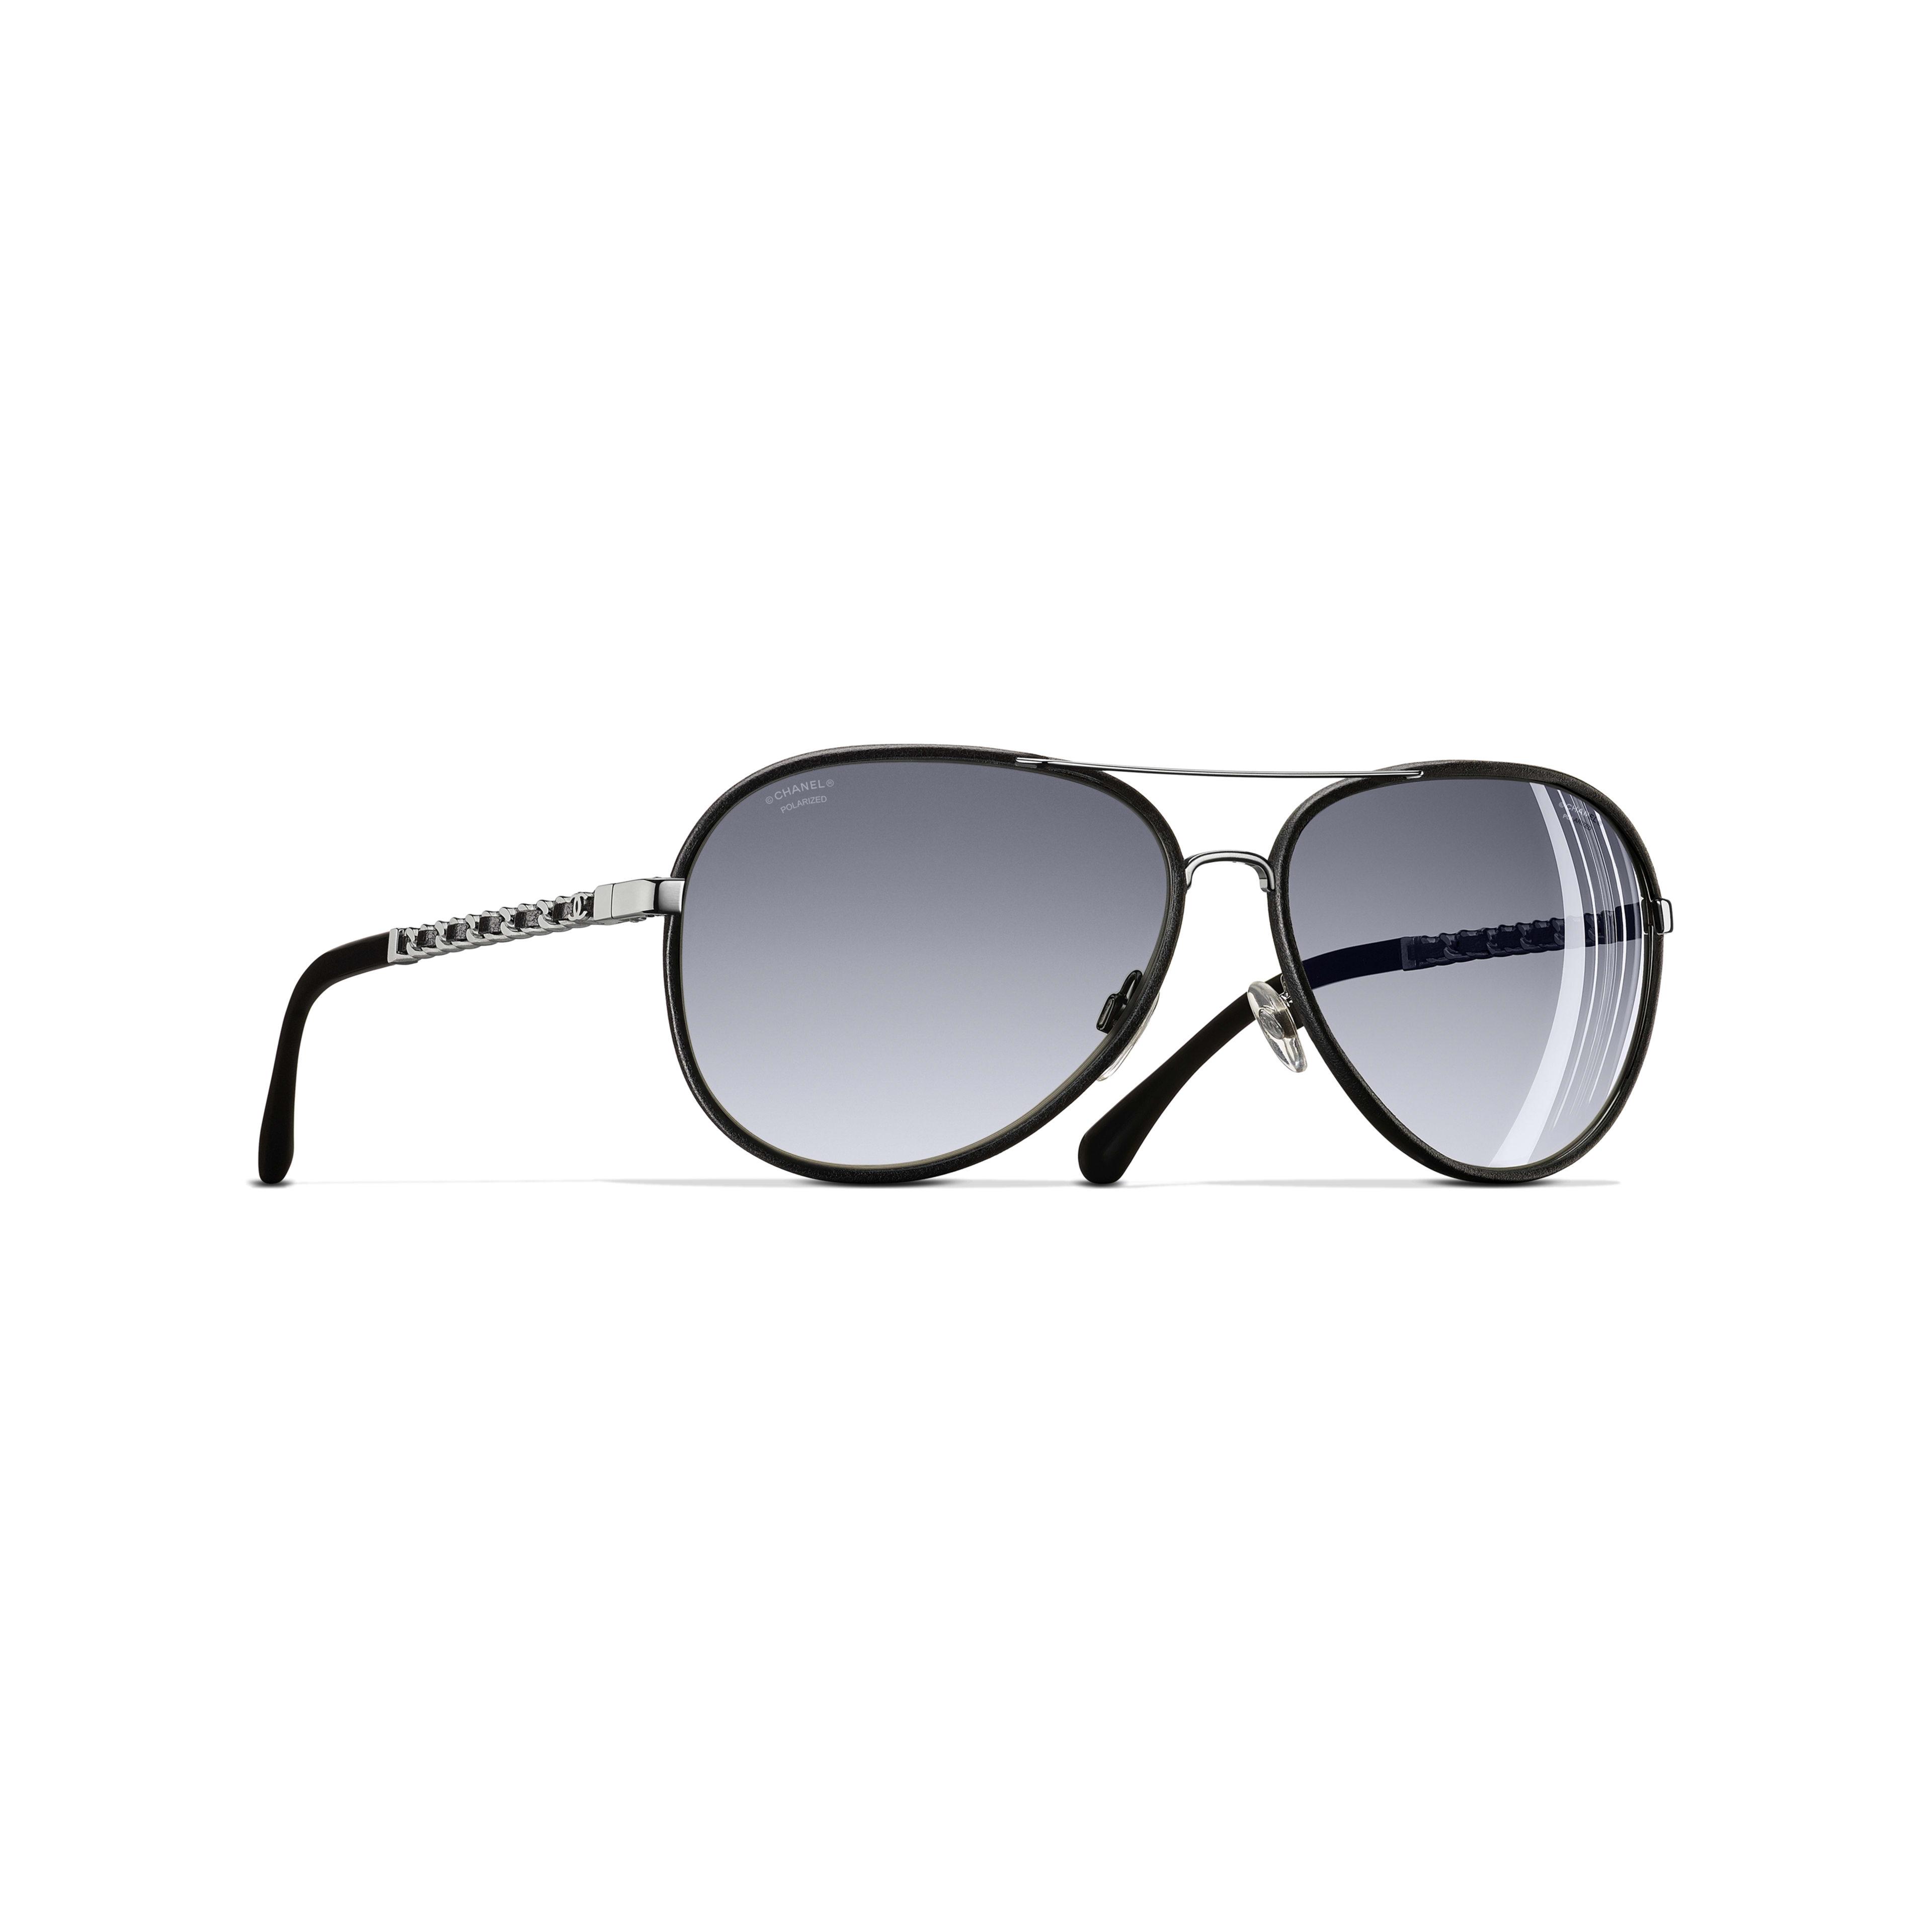 Pilot Sunglasses - Black - Metal & Calfskin - Polarized Lenses - Default view - see full sized version